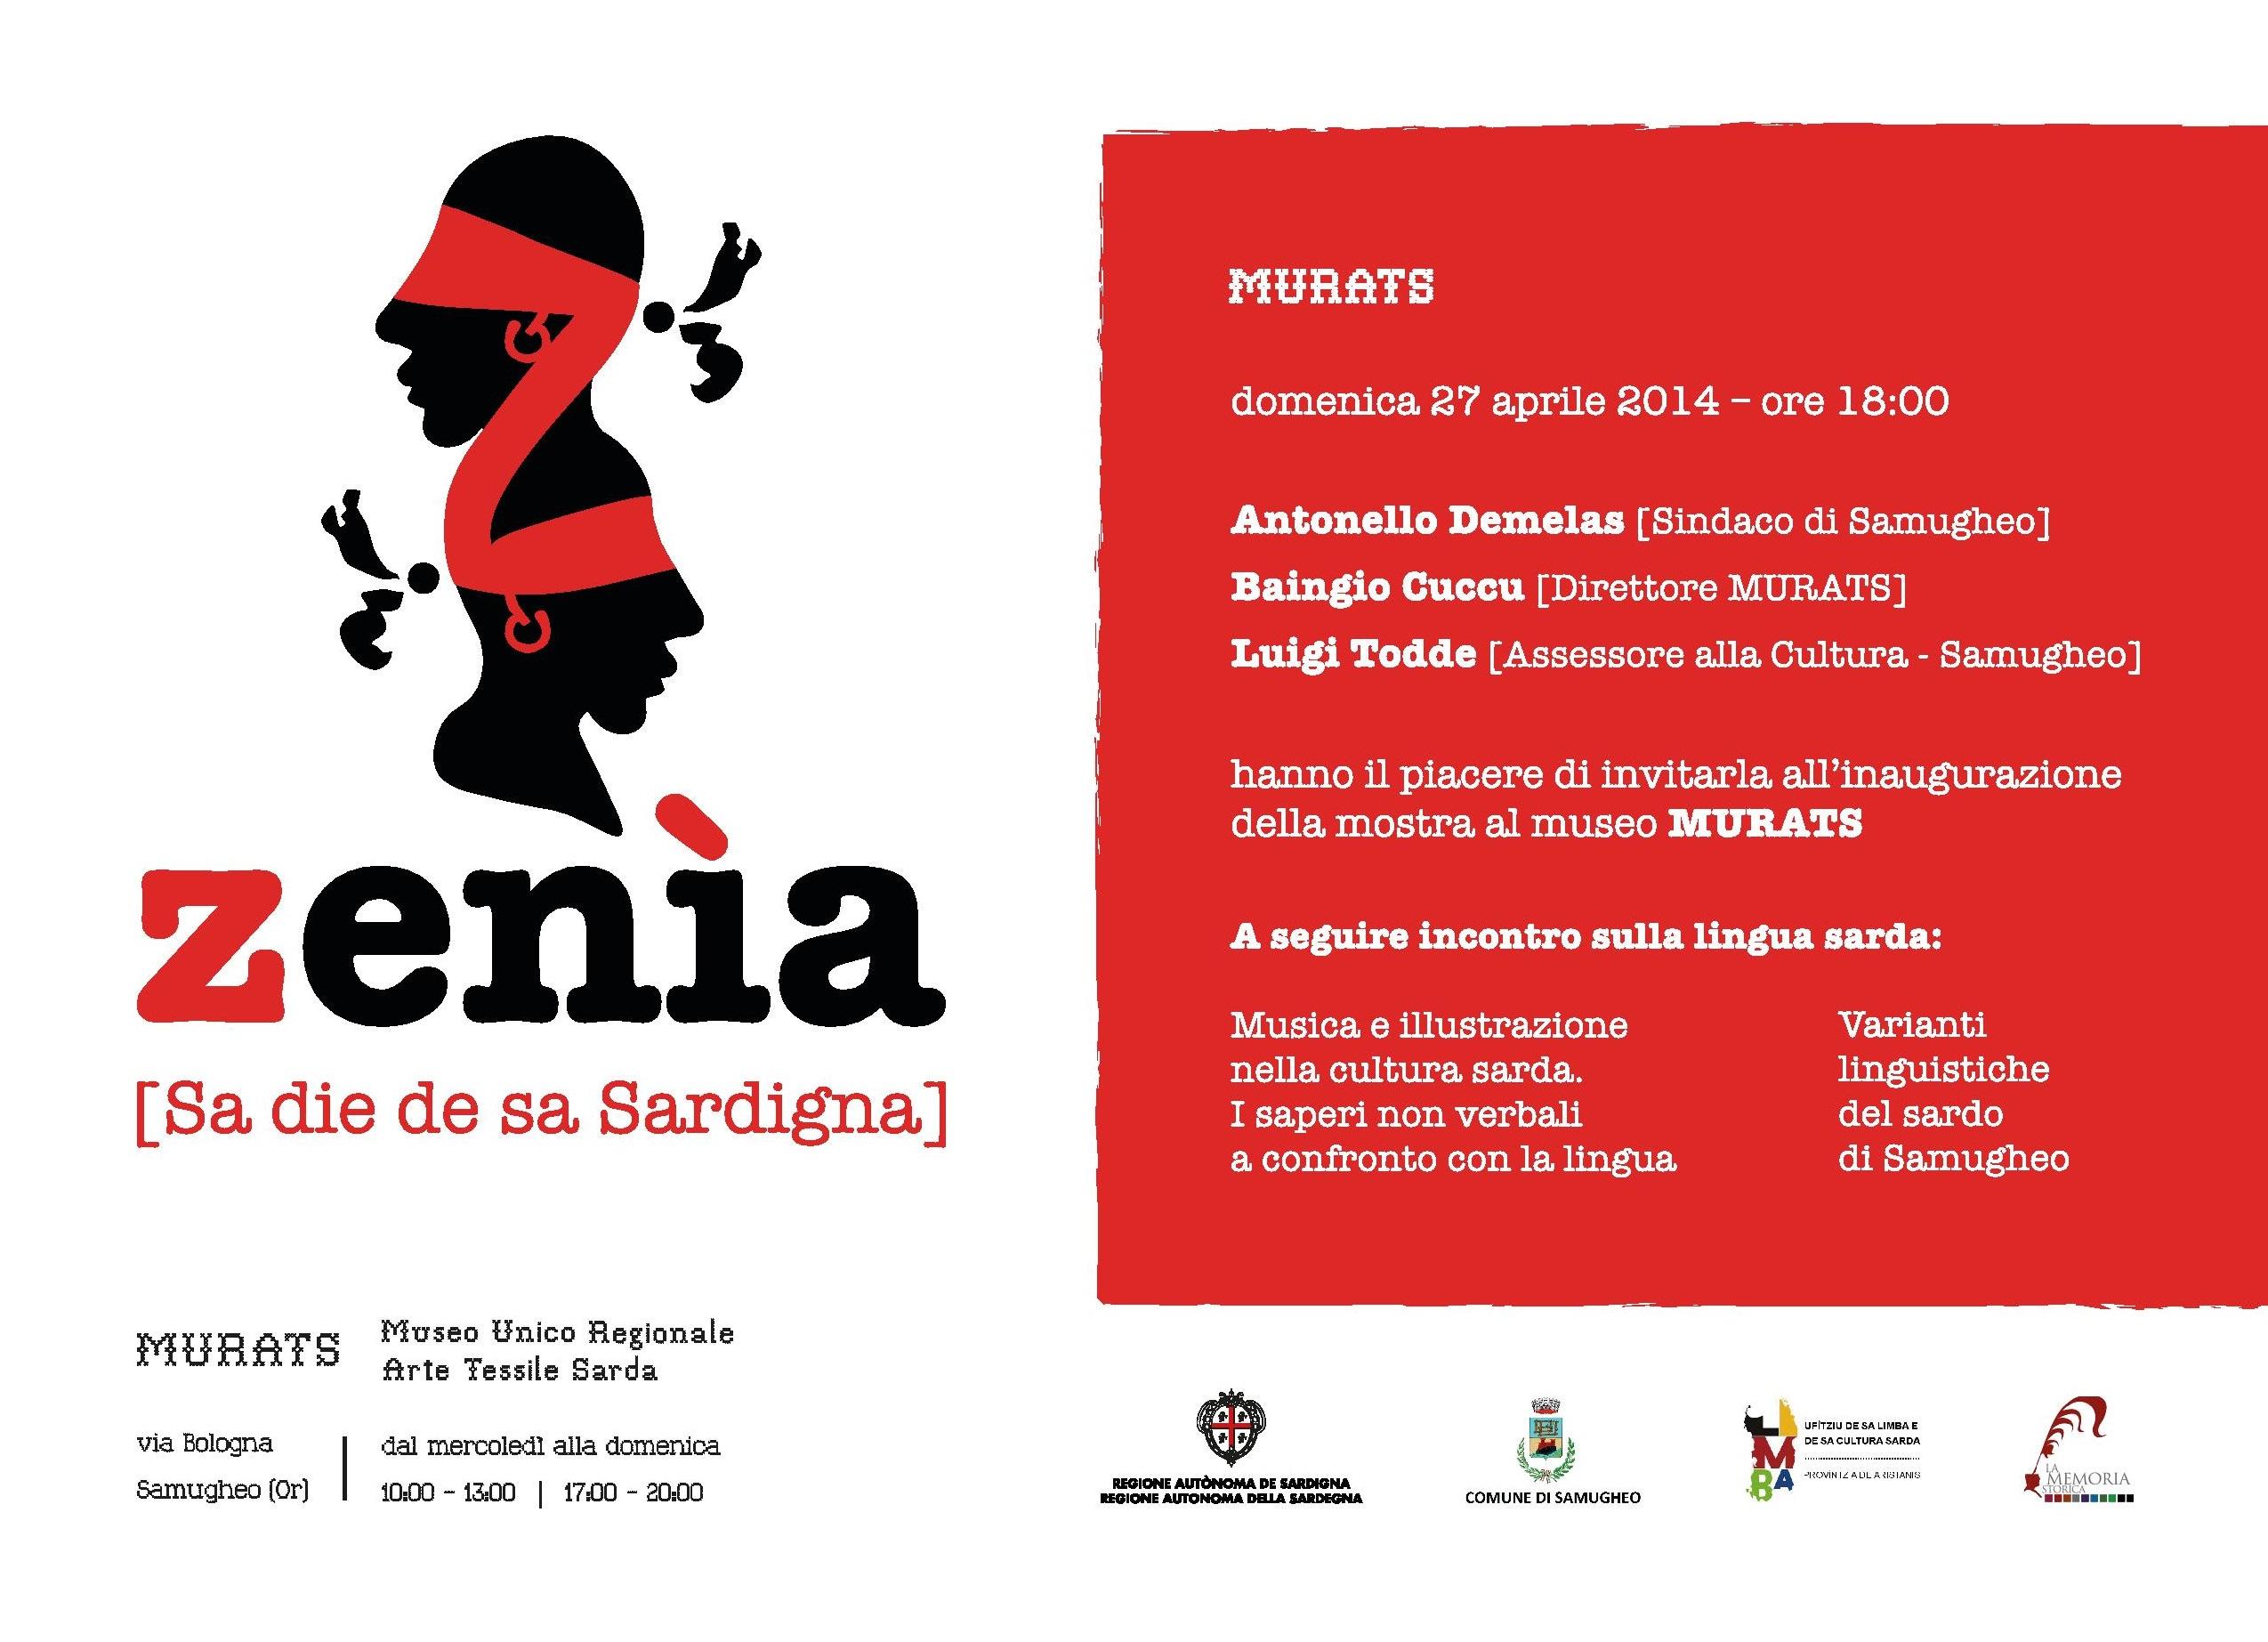 Zenìa Mostra al Museo MURATS di Samugheo da aprile a giugno 2014 dedicata a Sa die de sa Sardigna.